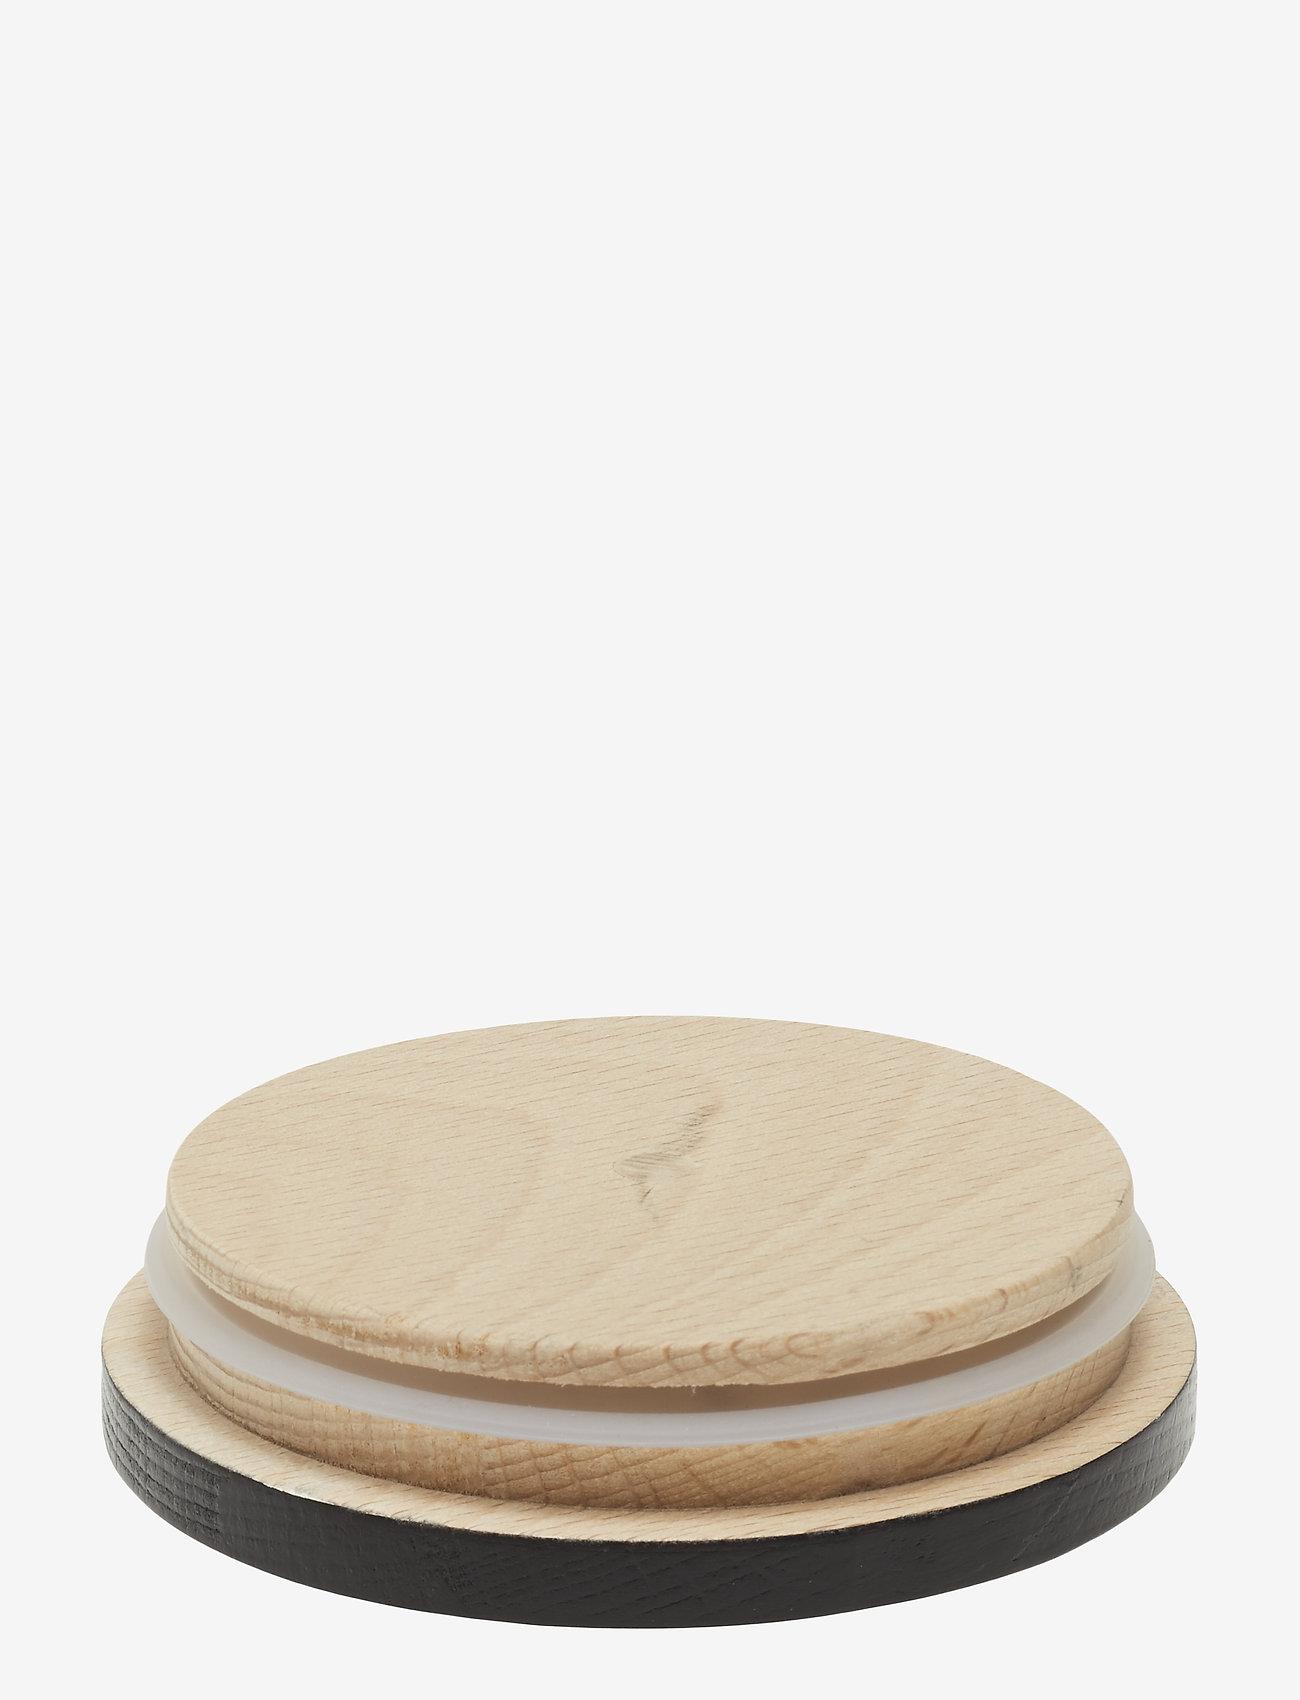 Wooden Lid For Porcelain Cup (Black) (8 €) - Design Letters CbICI